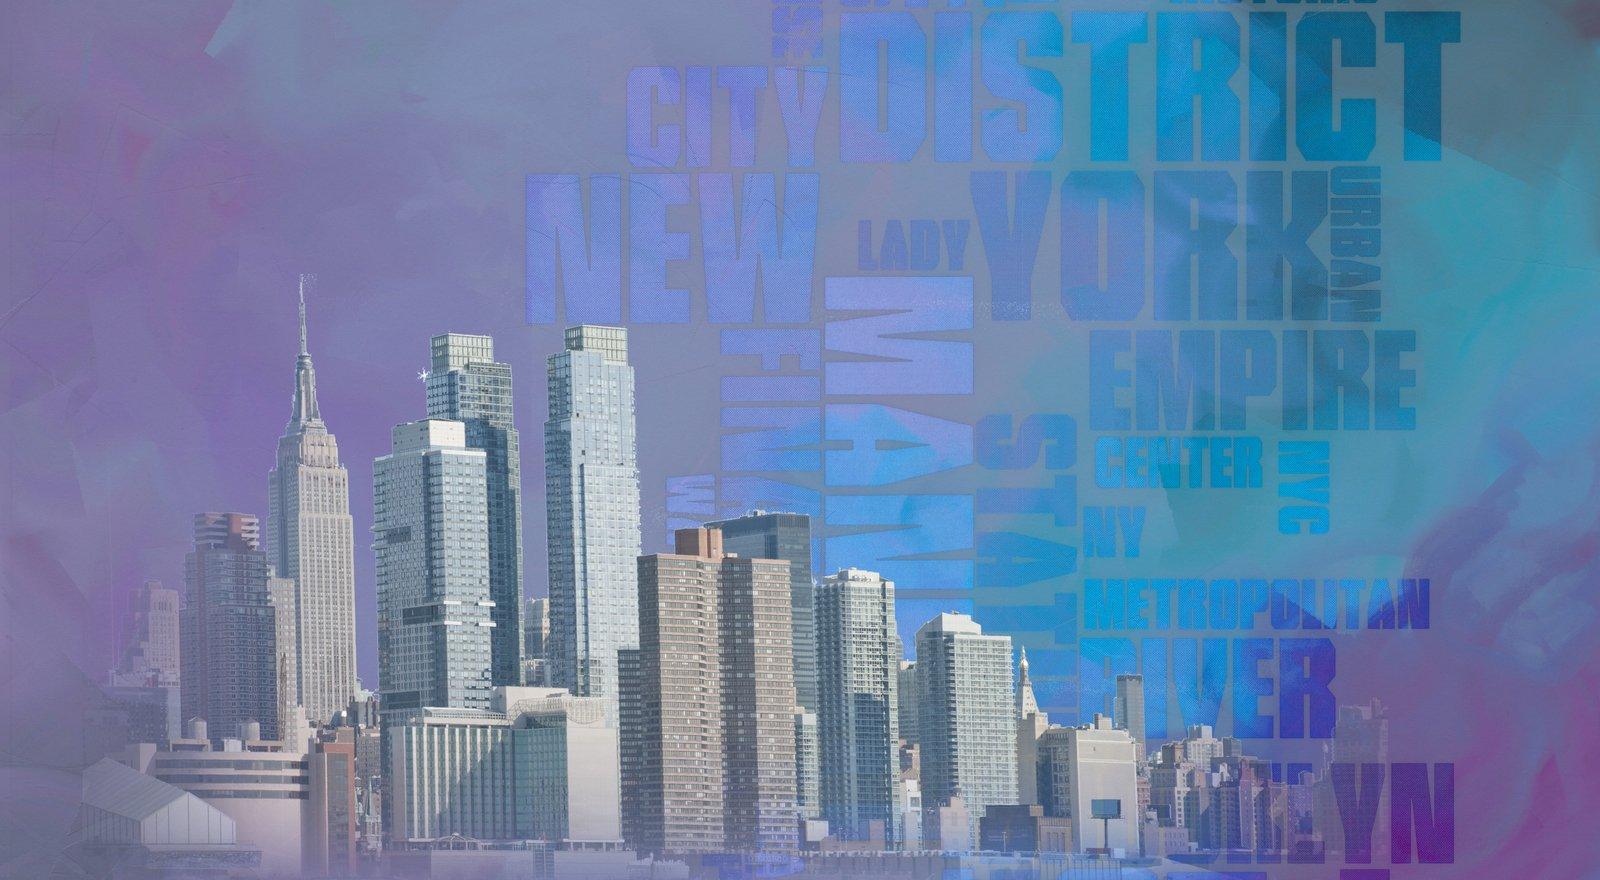 Battery Park City Manhattan, NY Private Investigator